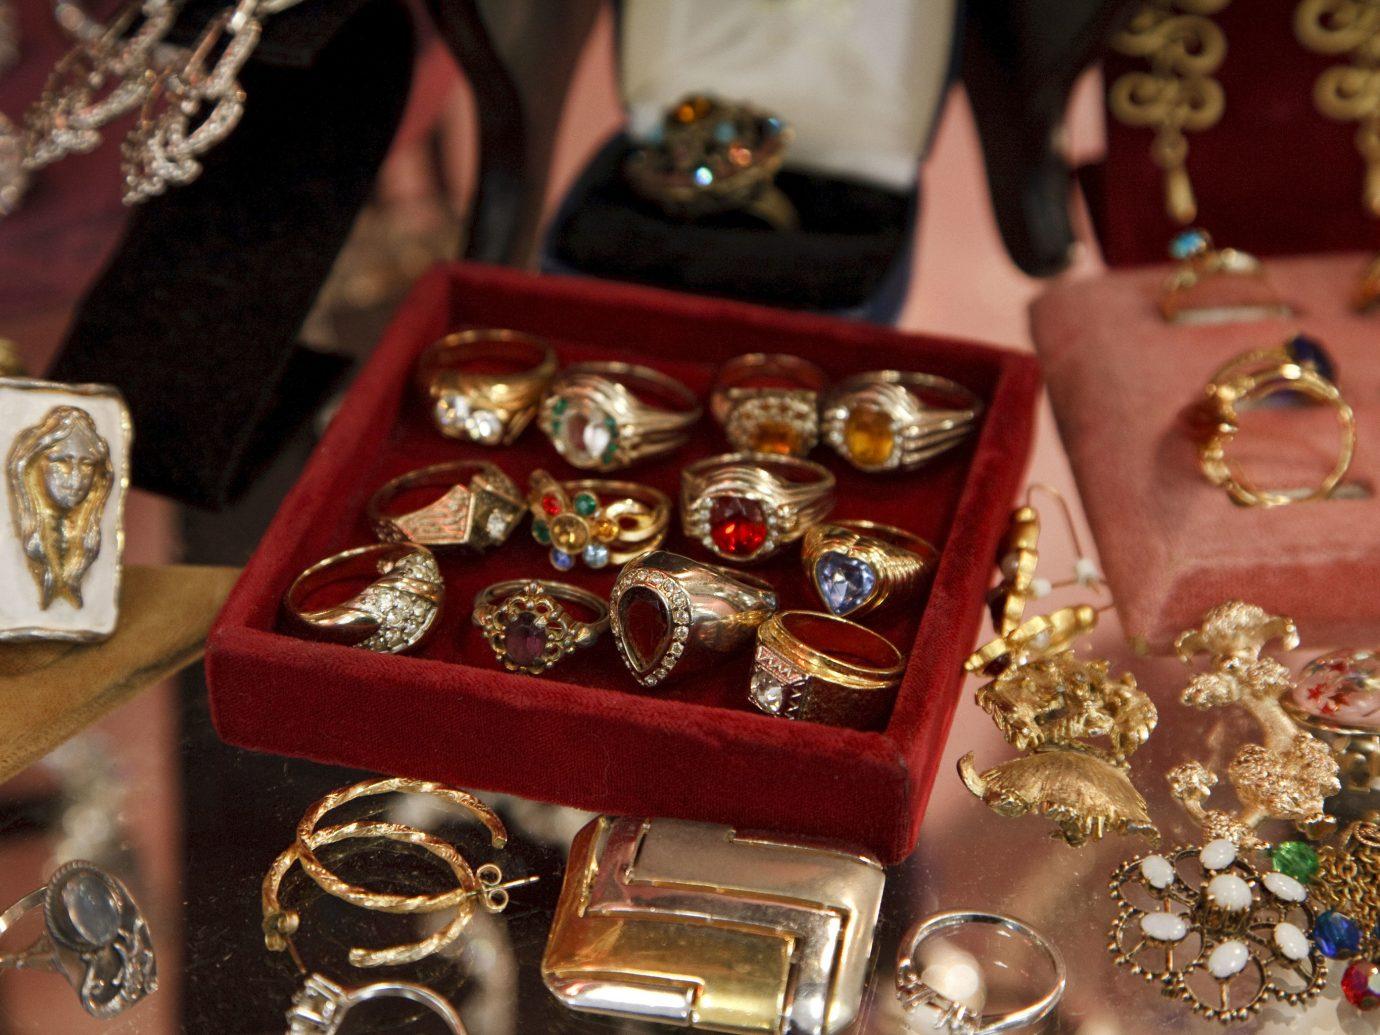 Trip Ideas indoor gold jewellery chocolate sweetness dessert several